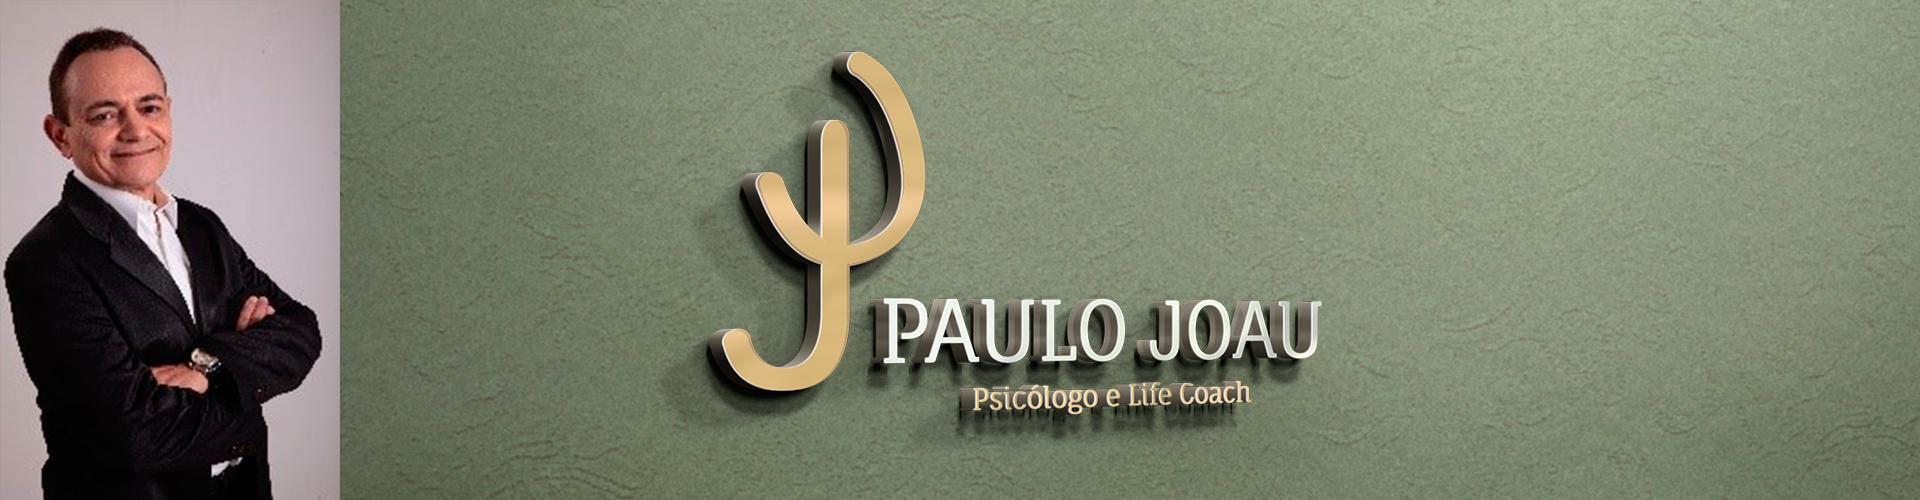 paulo-joau-banner